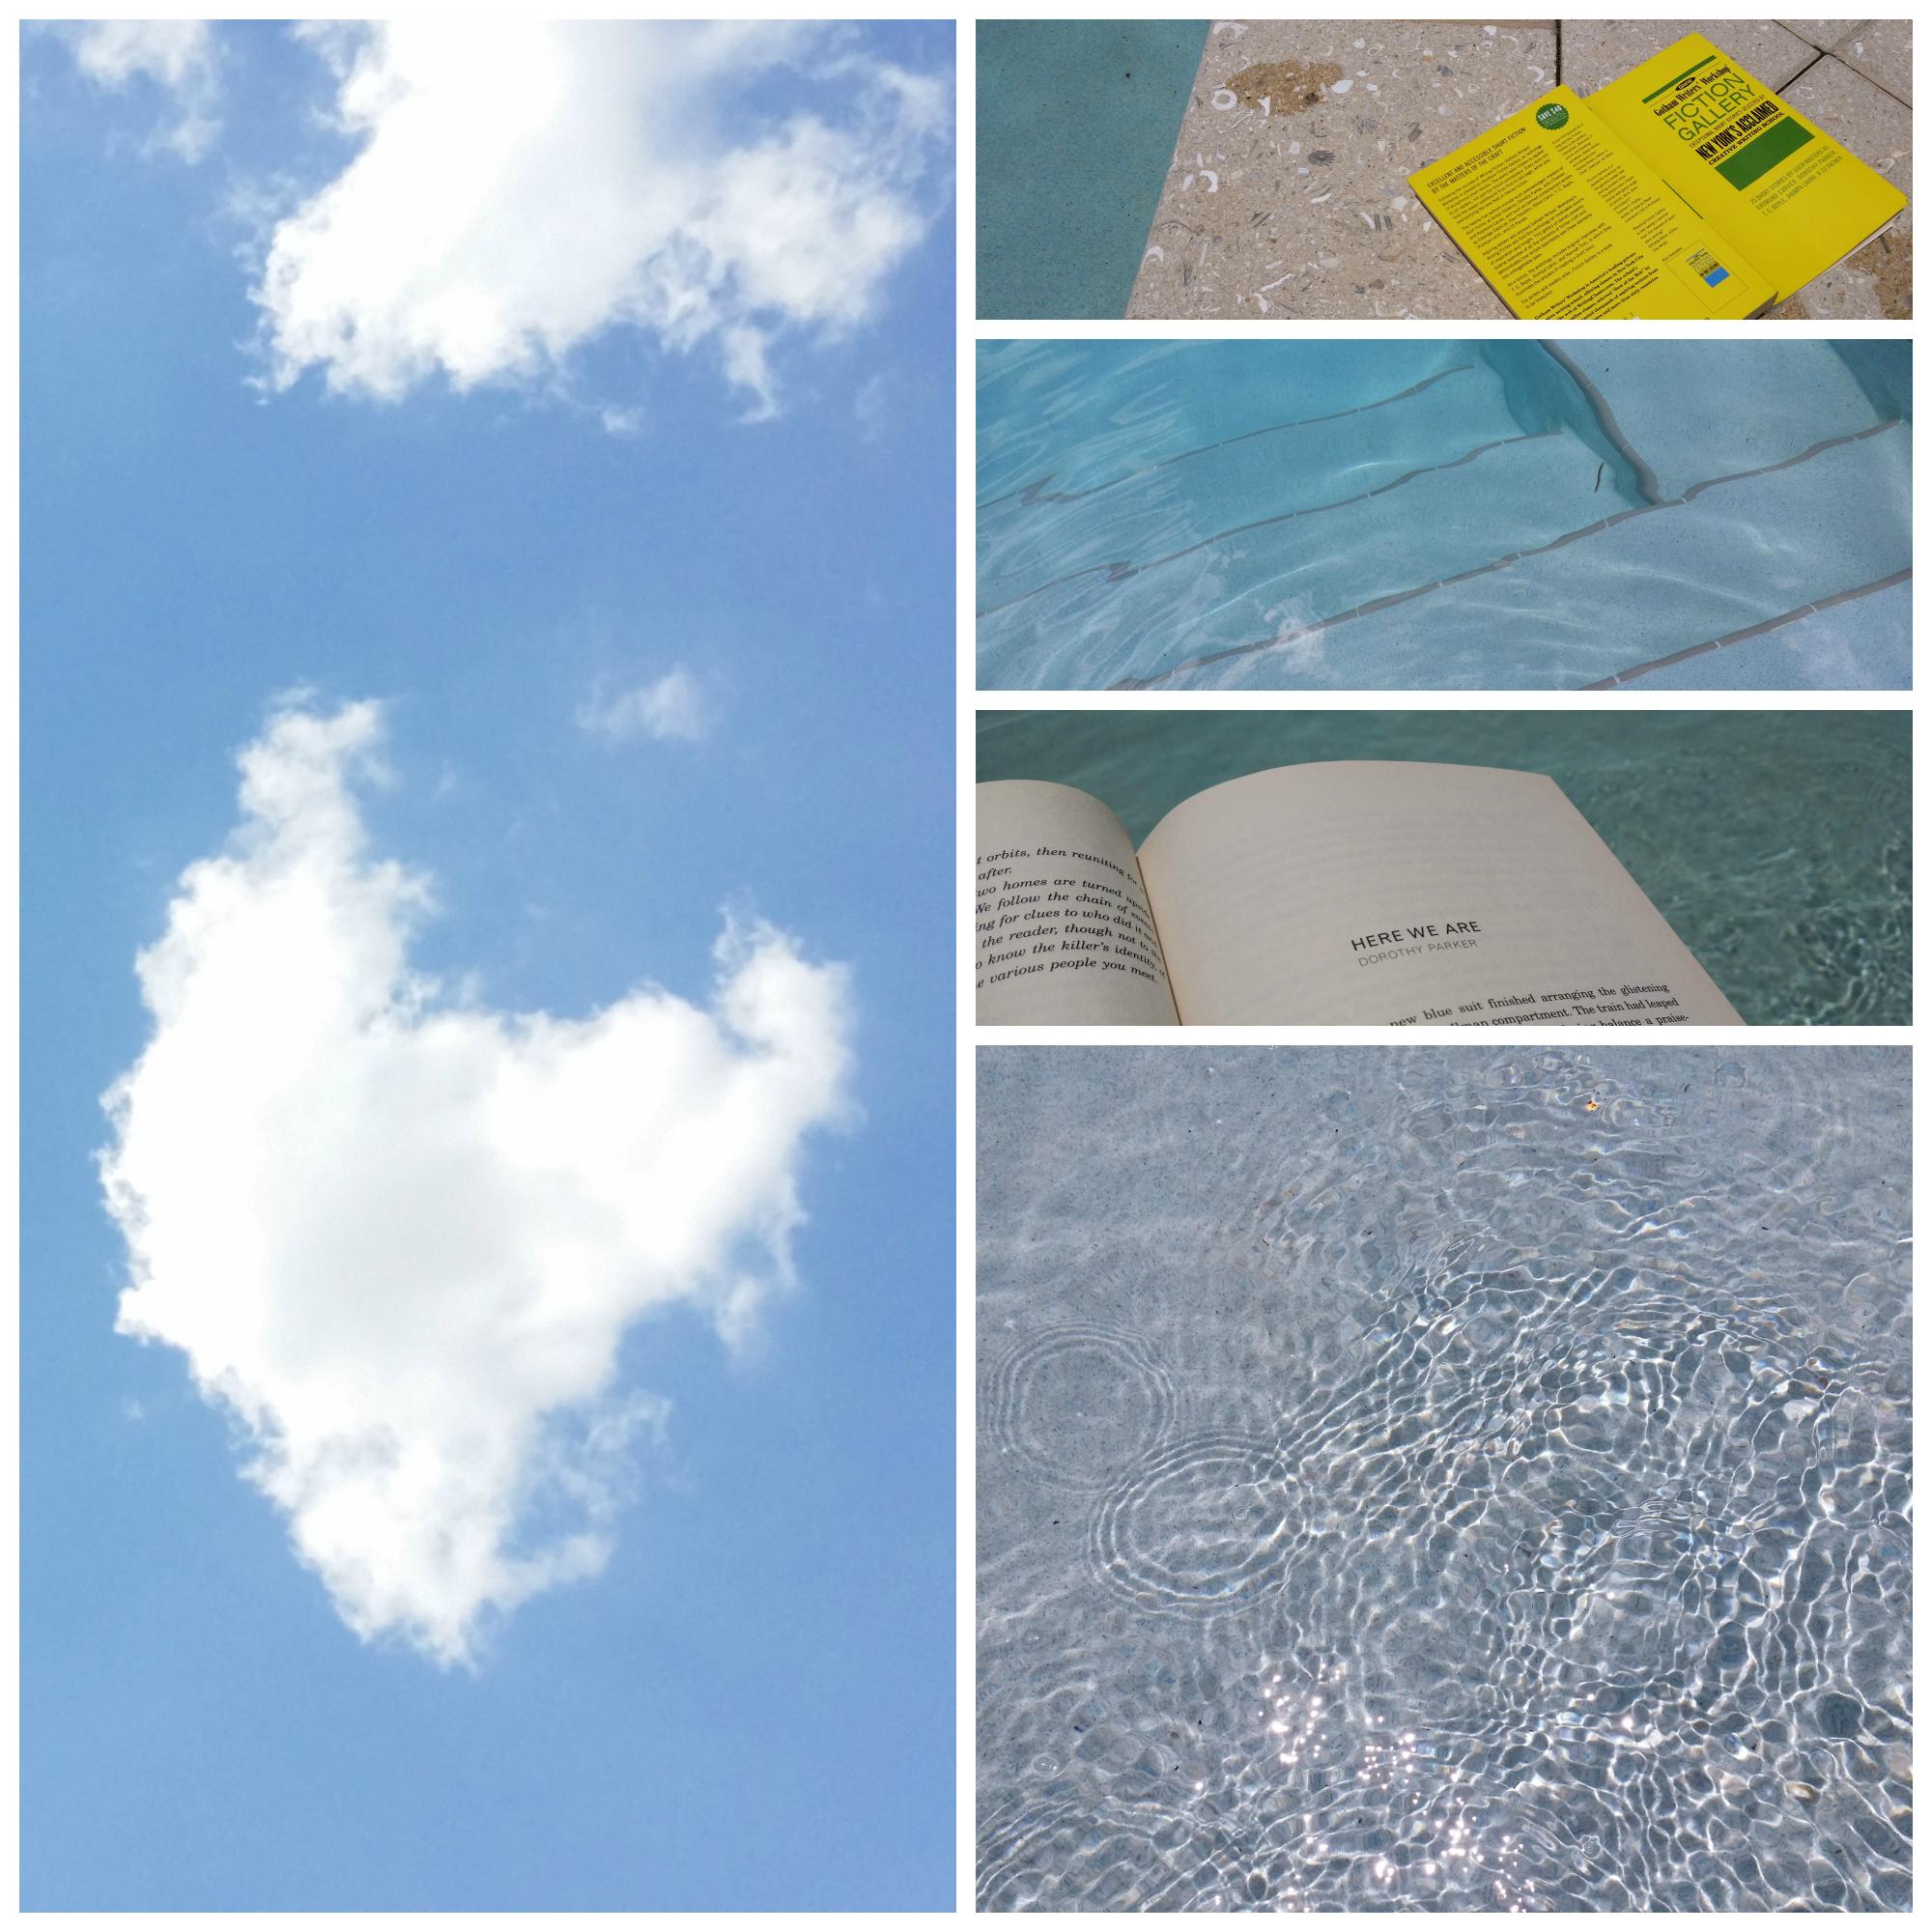 blue skies yellow book